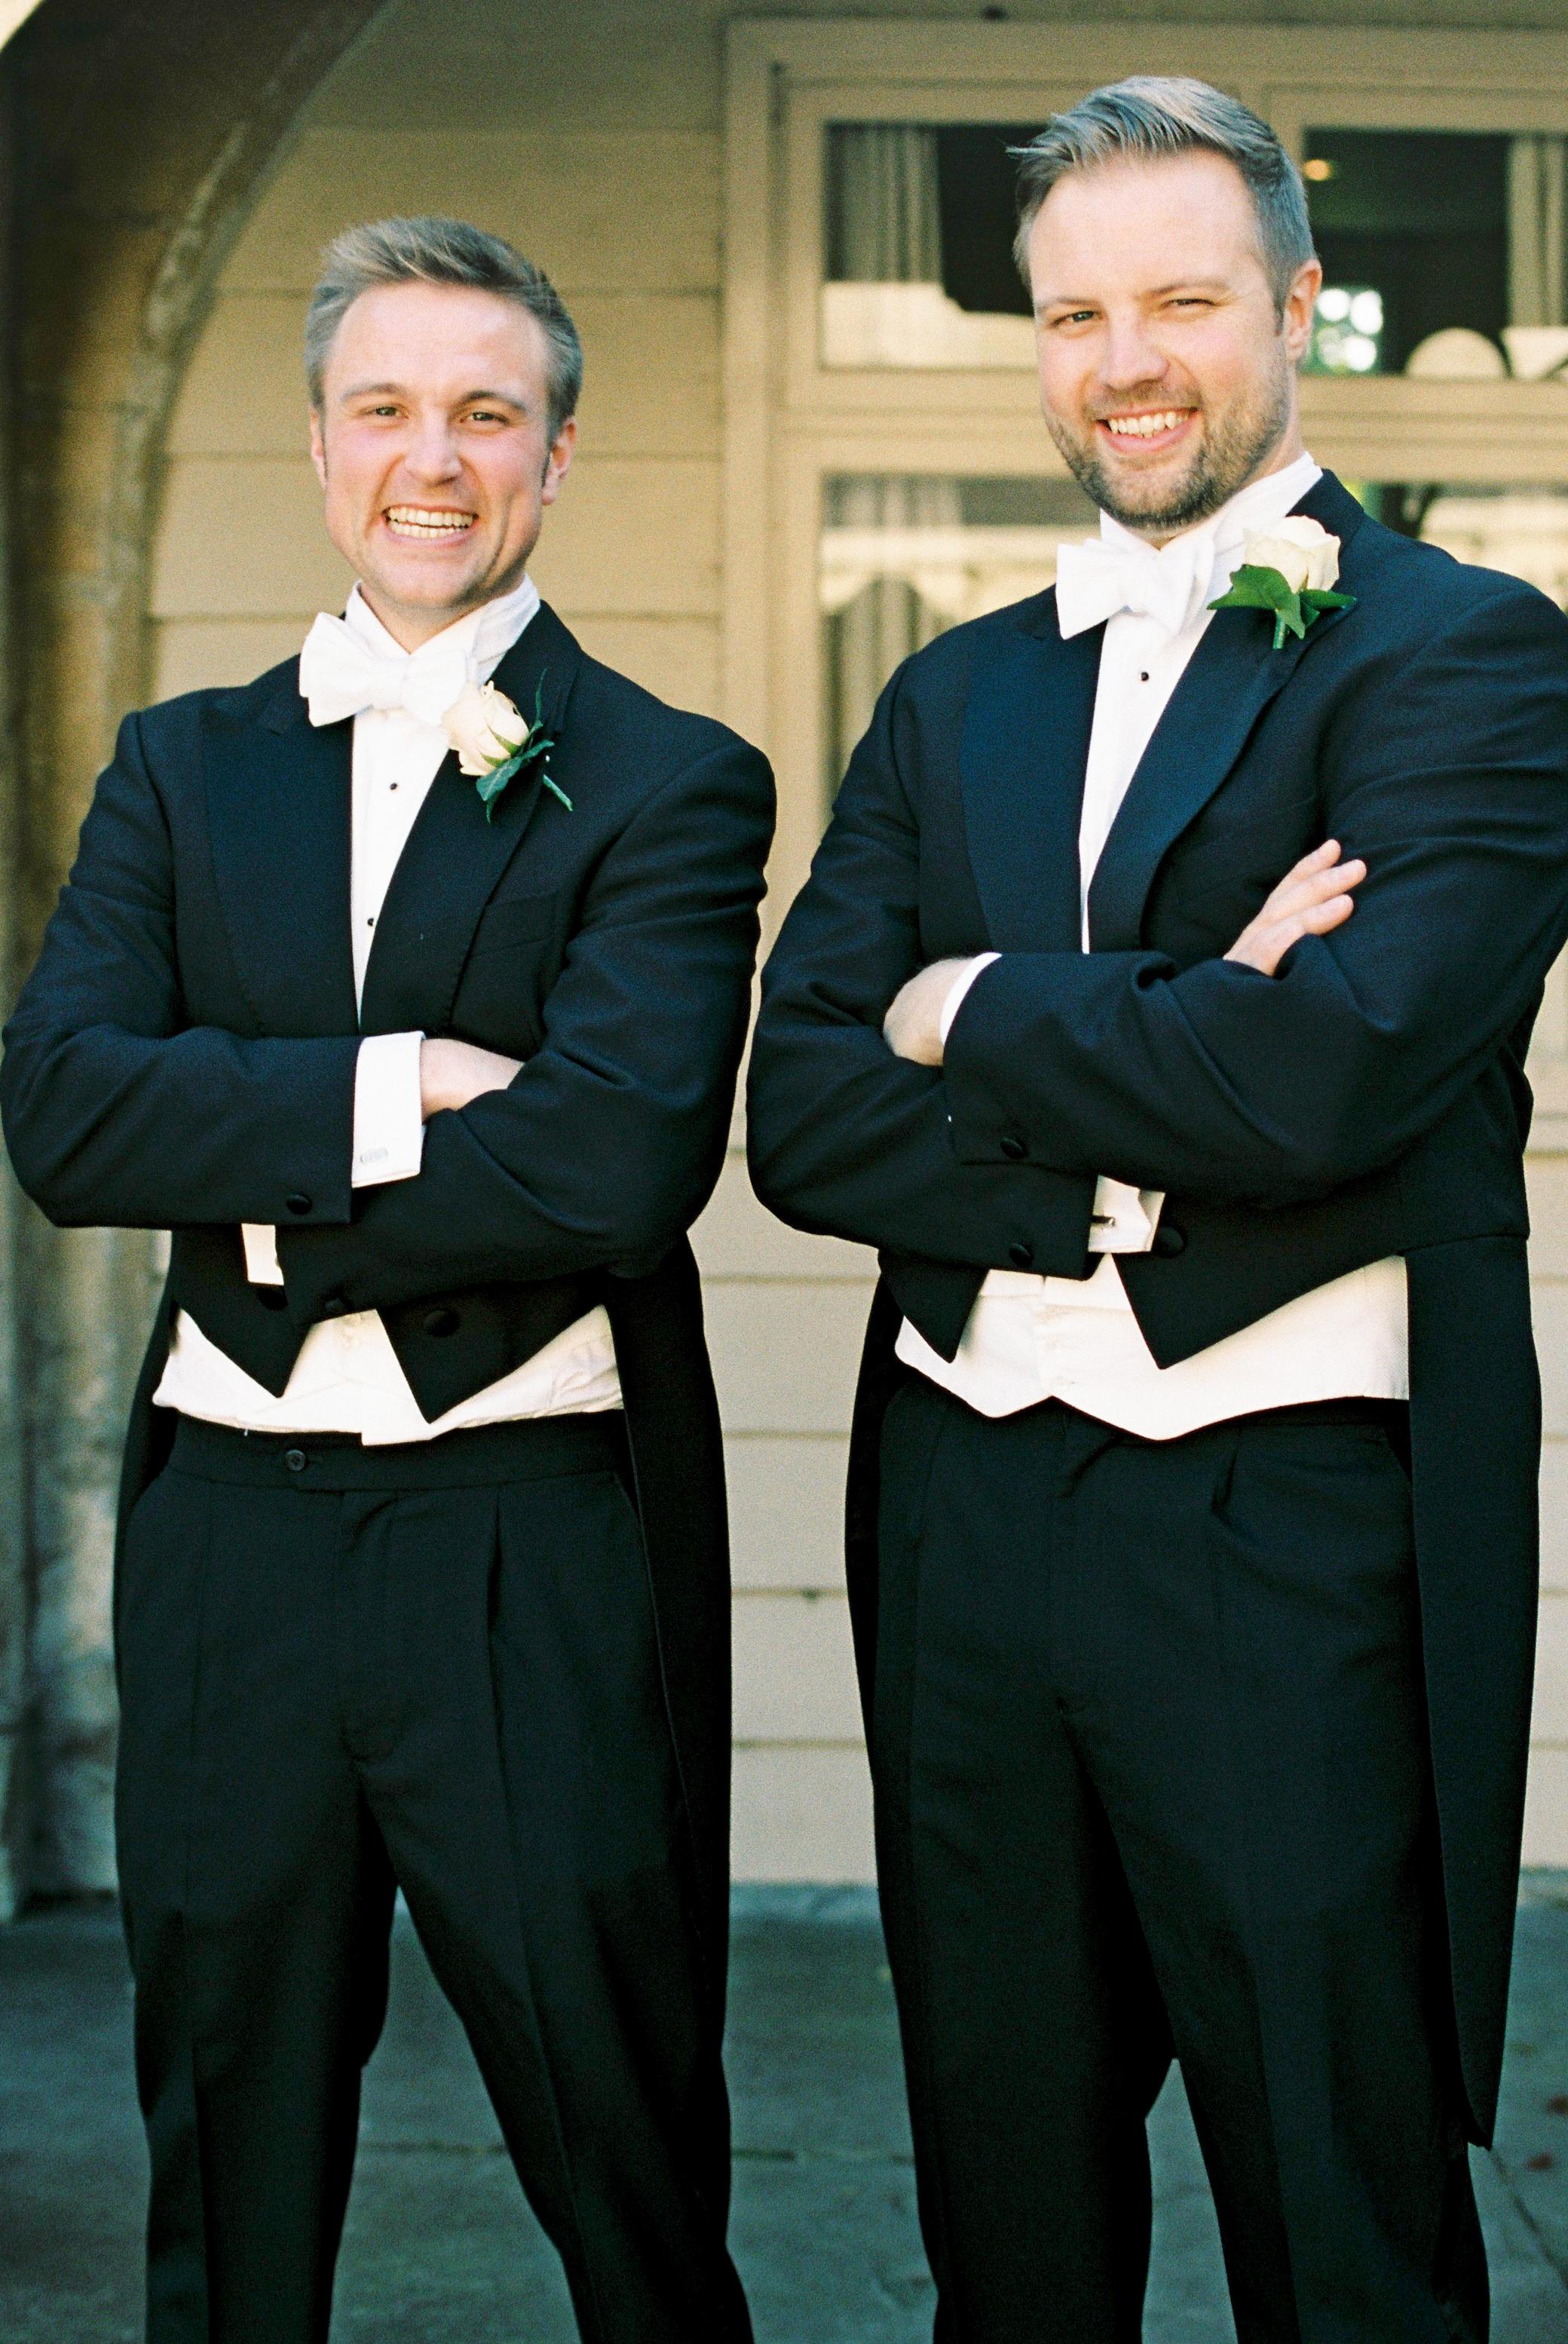 england_wedding_(c)_rory_wylie-5.jpg